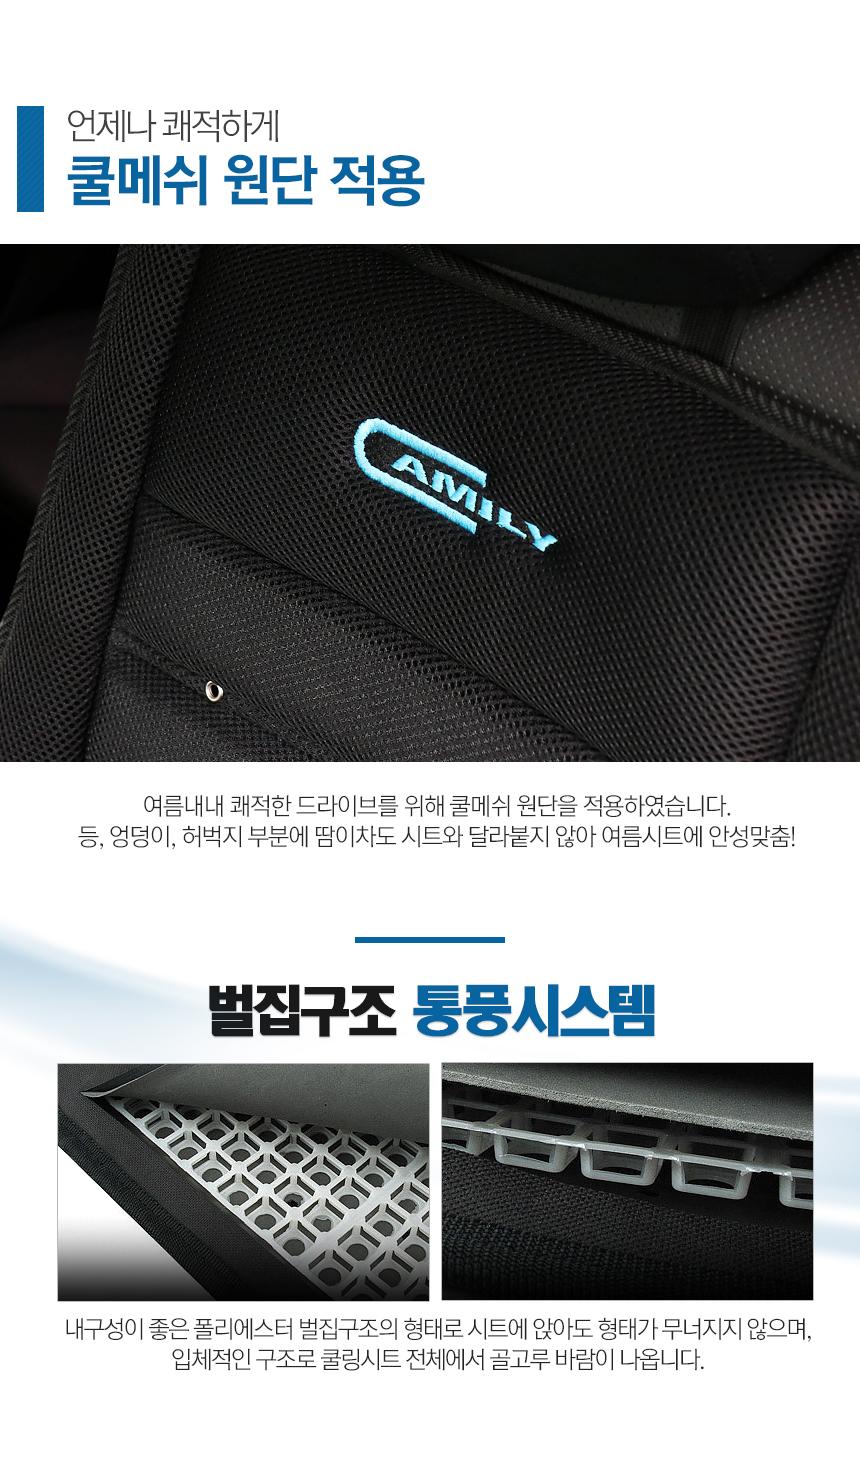 Carmily_Cooling_Seat_02.jpg